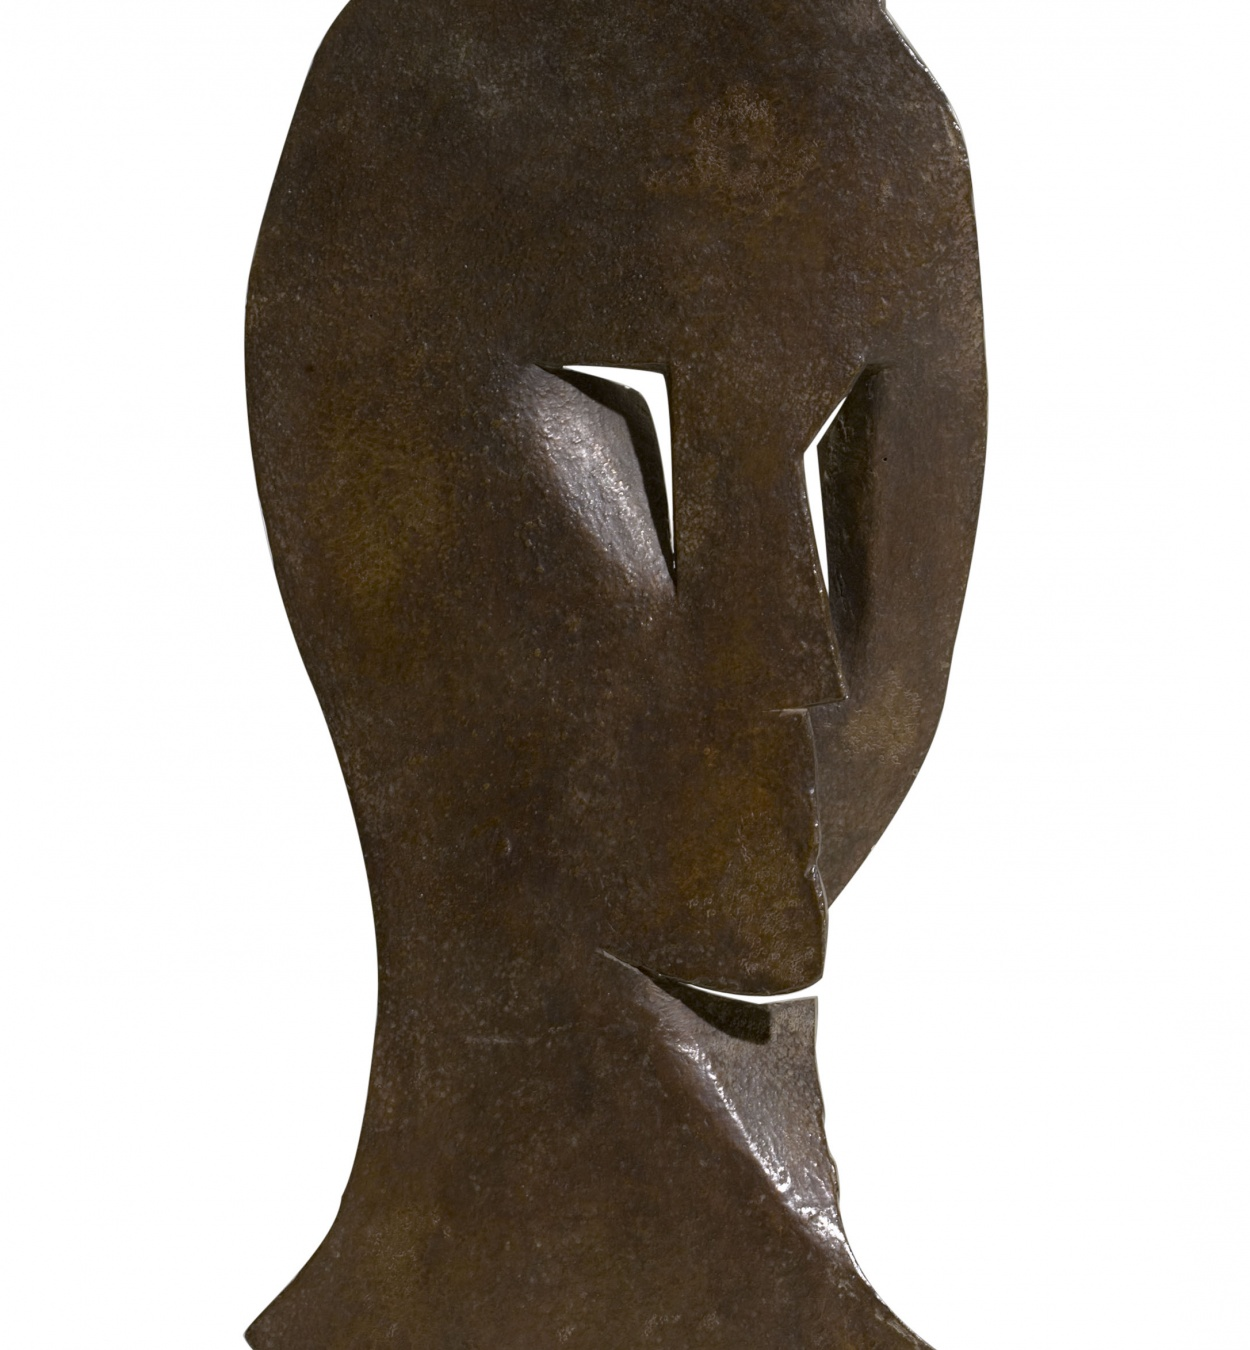 Juli González - Màscara d'adolescent - Cap a 1929-1930